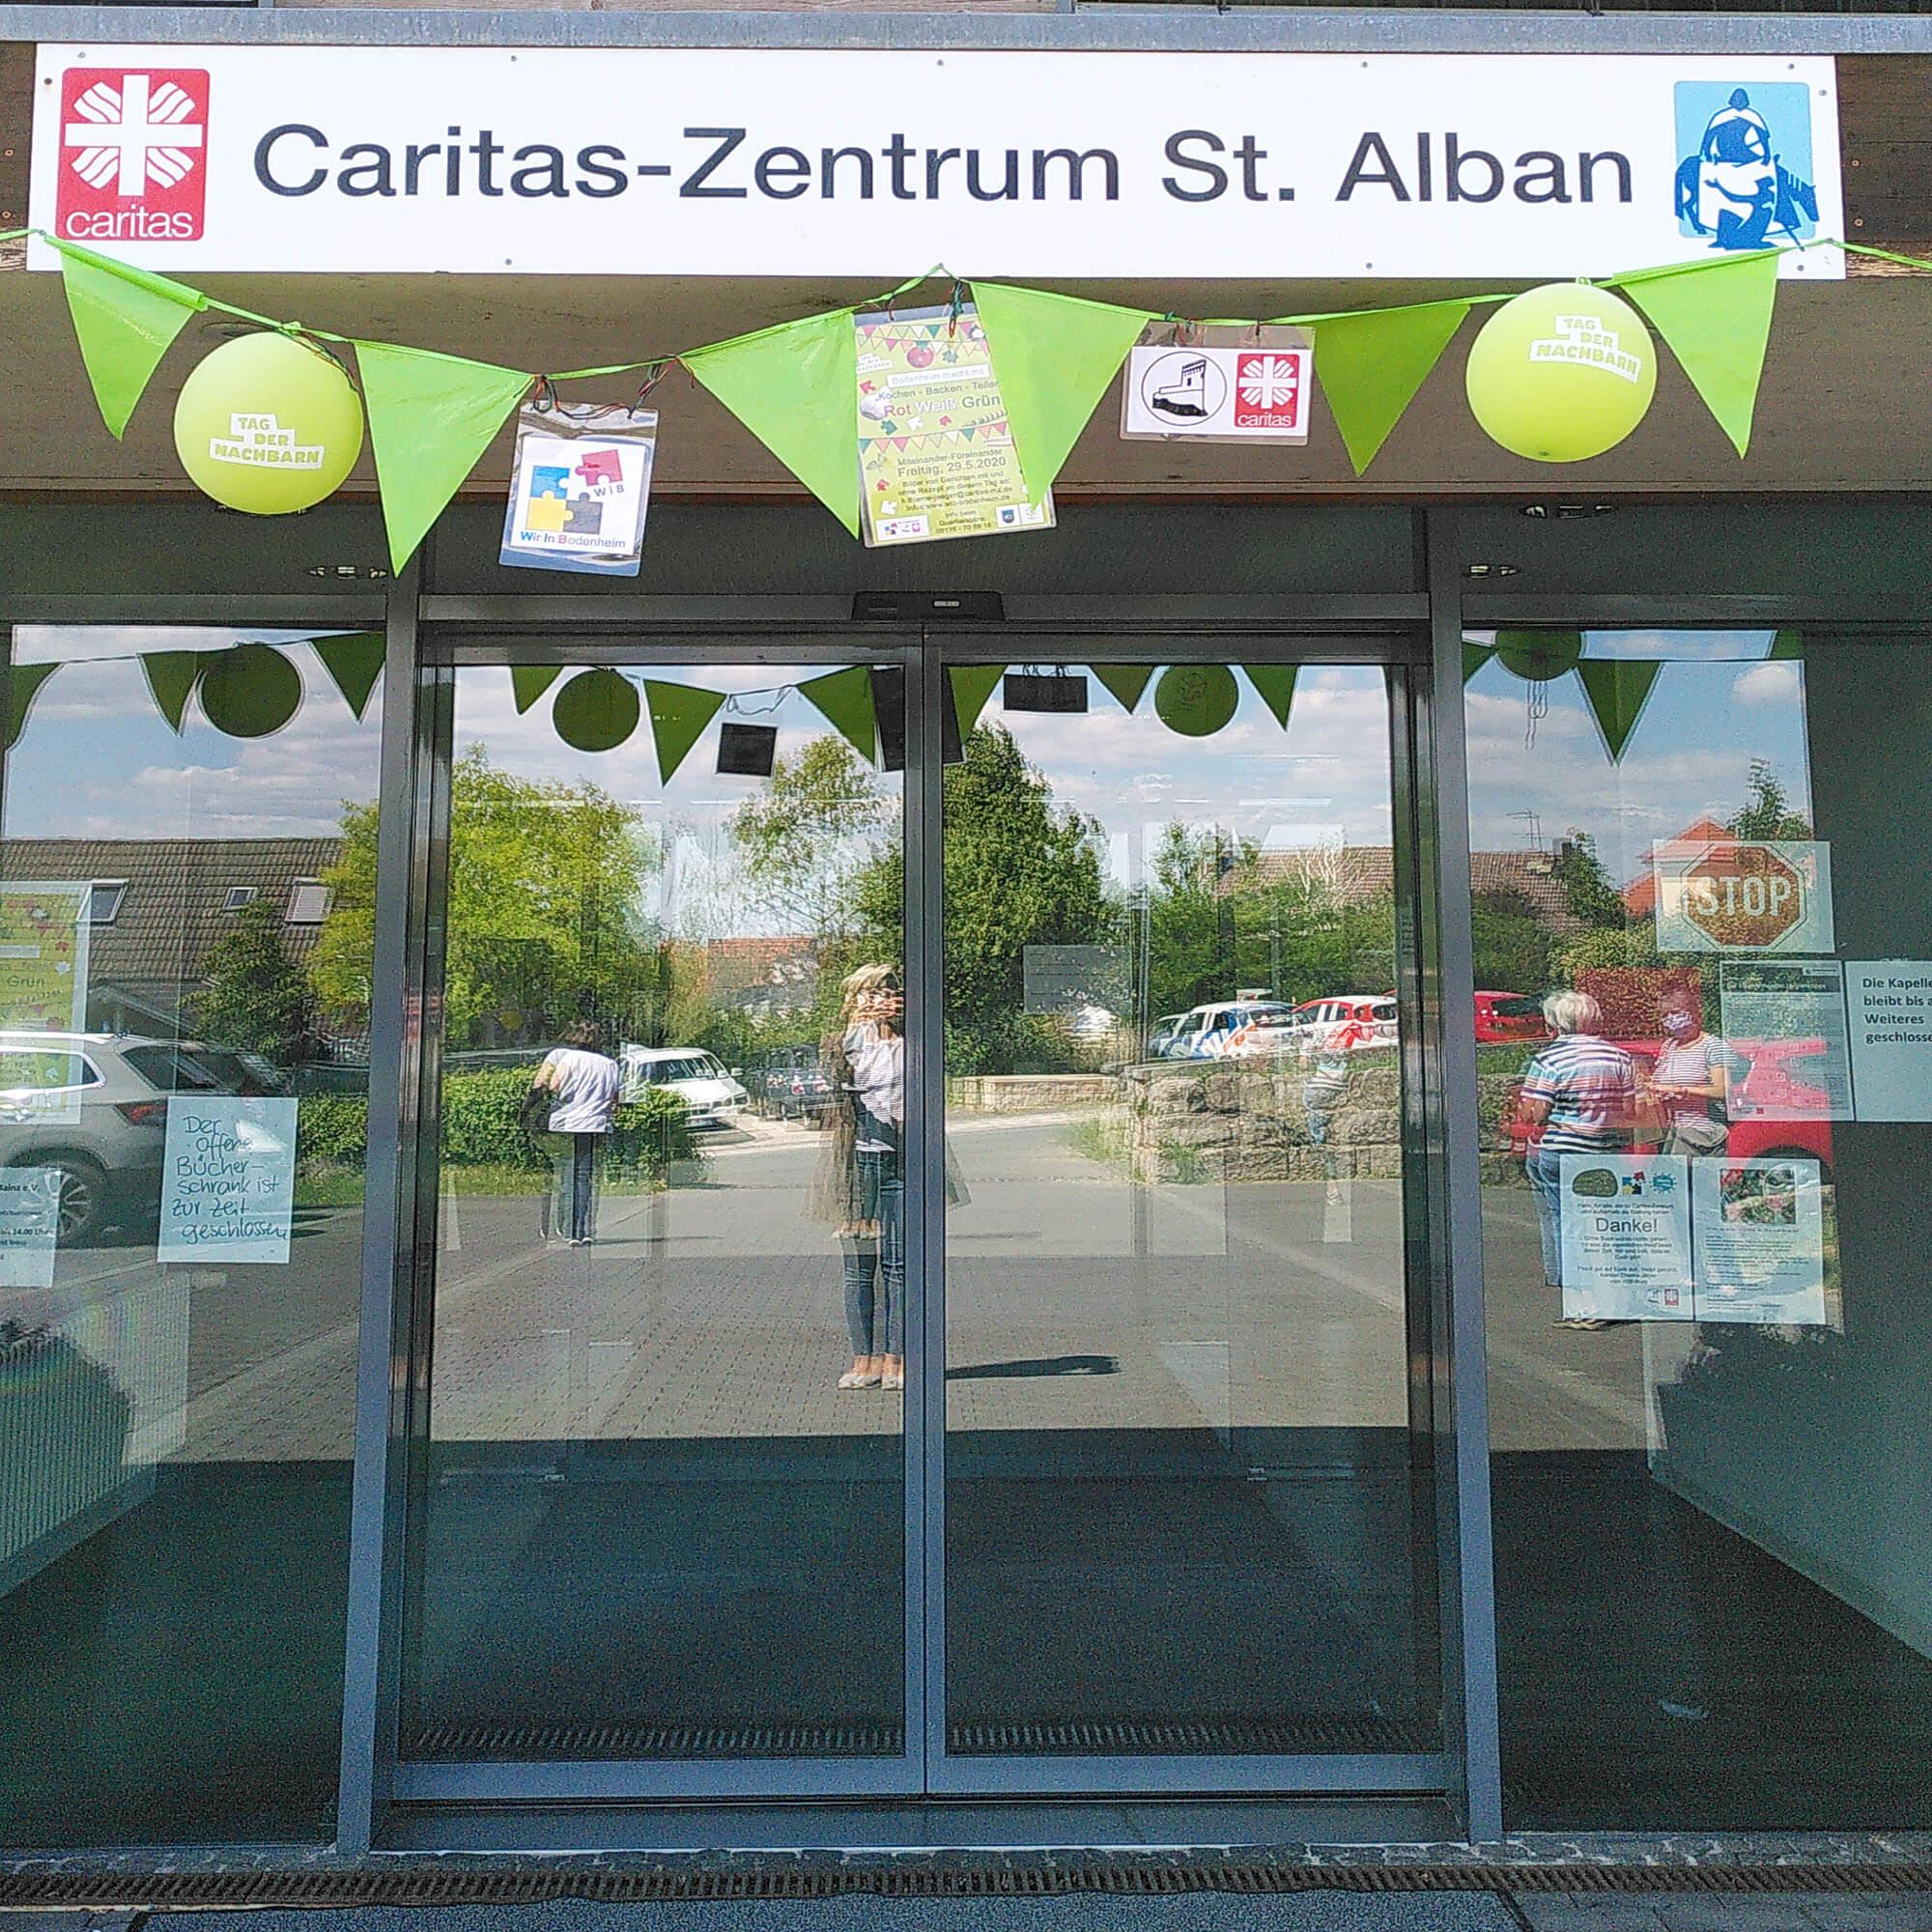 14a Caritas-Zentrum St.Alban, Girlande #tagdernachbarn